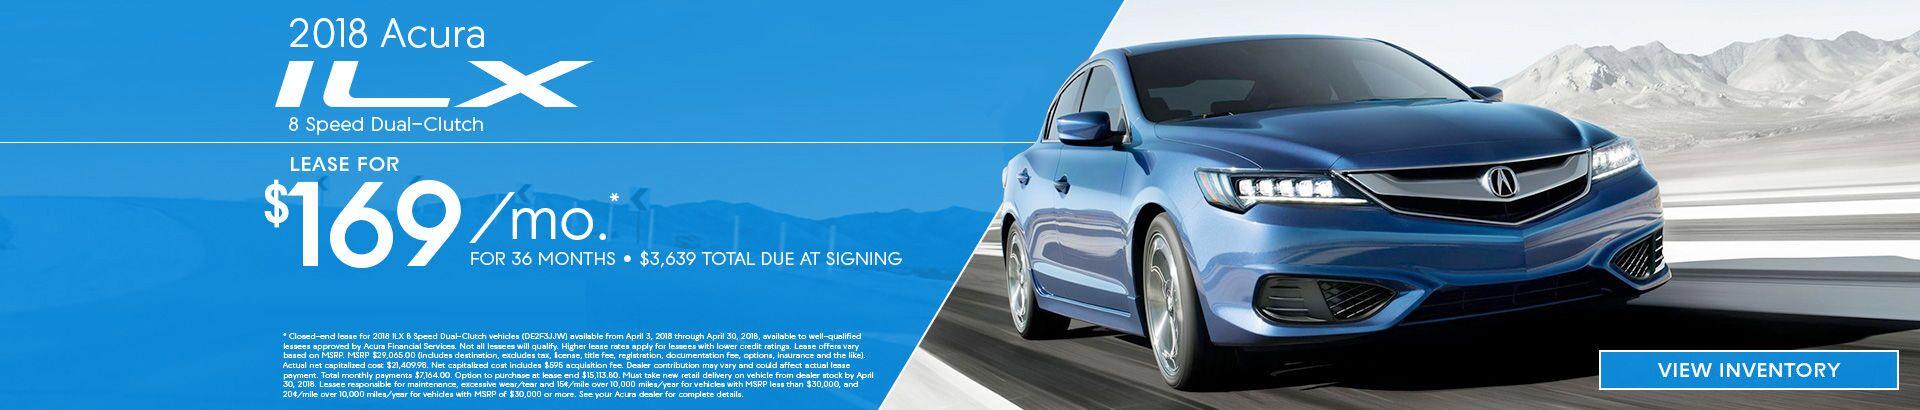 Las Vegas Acura Lease Special